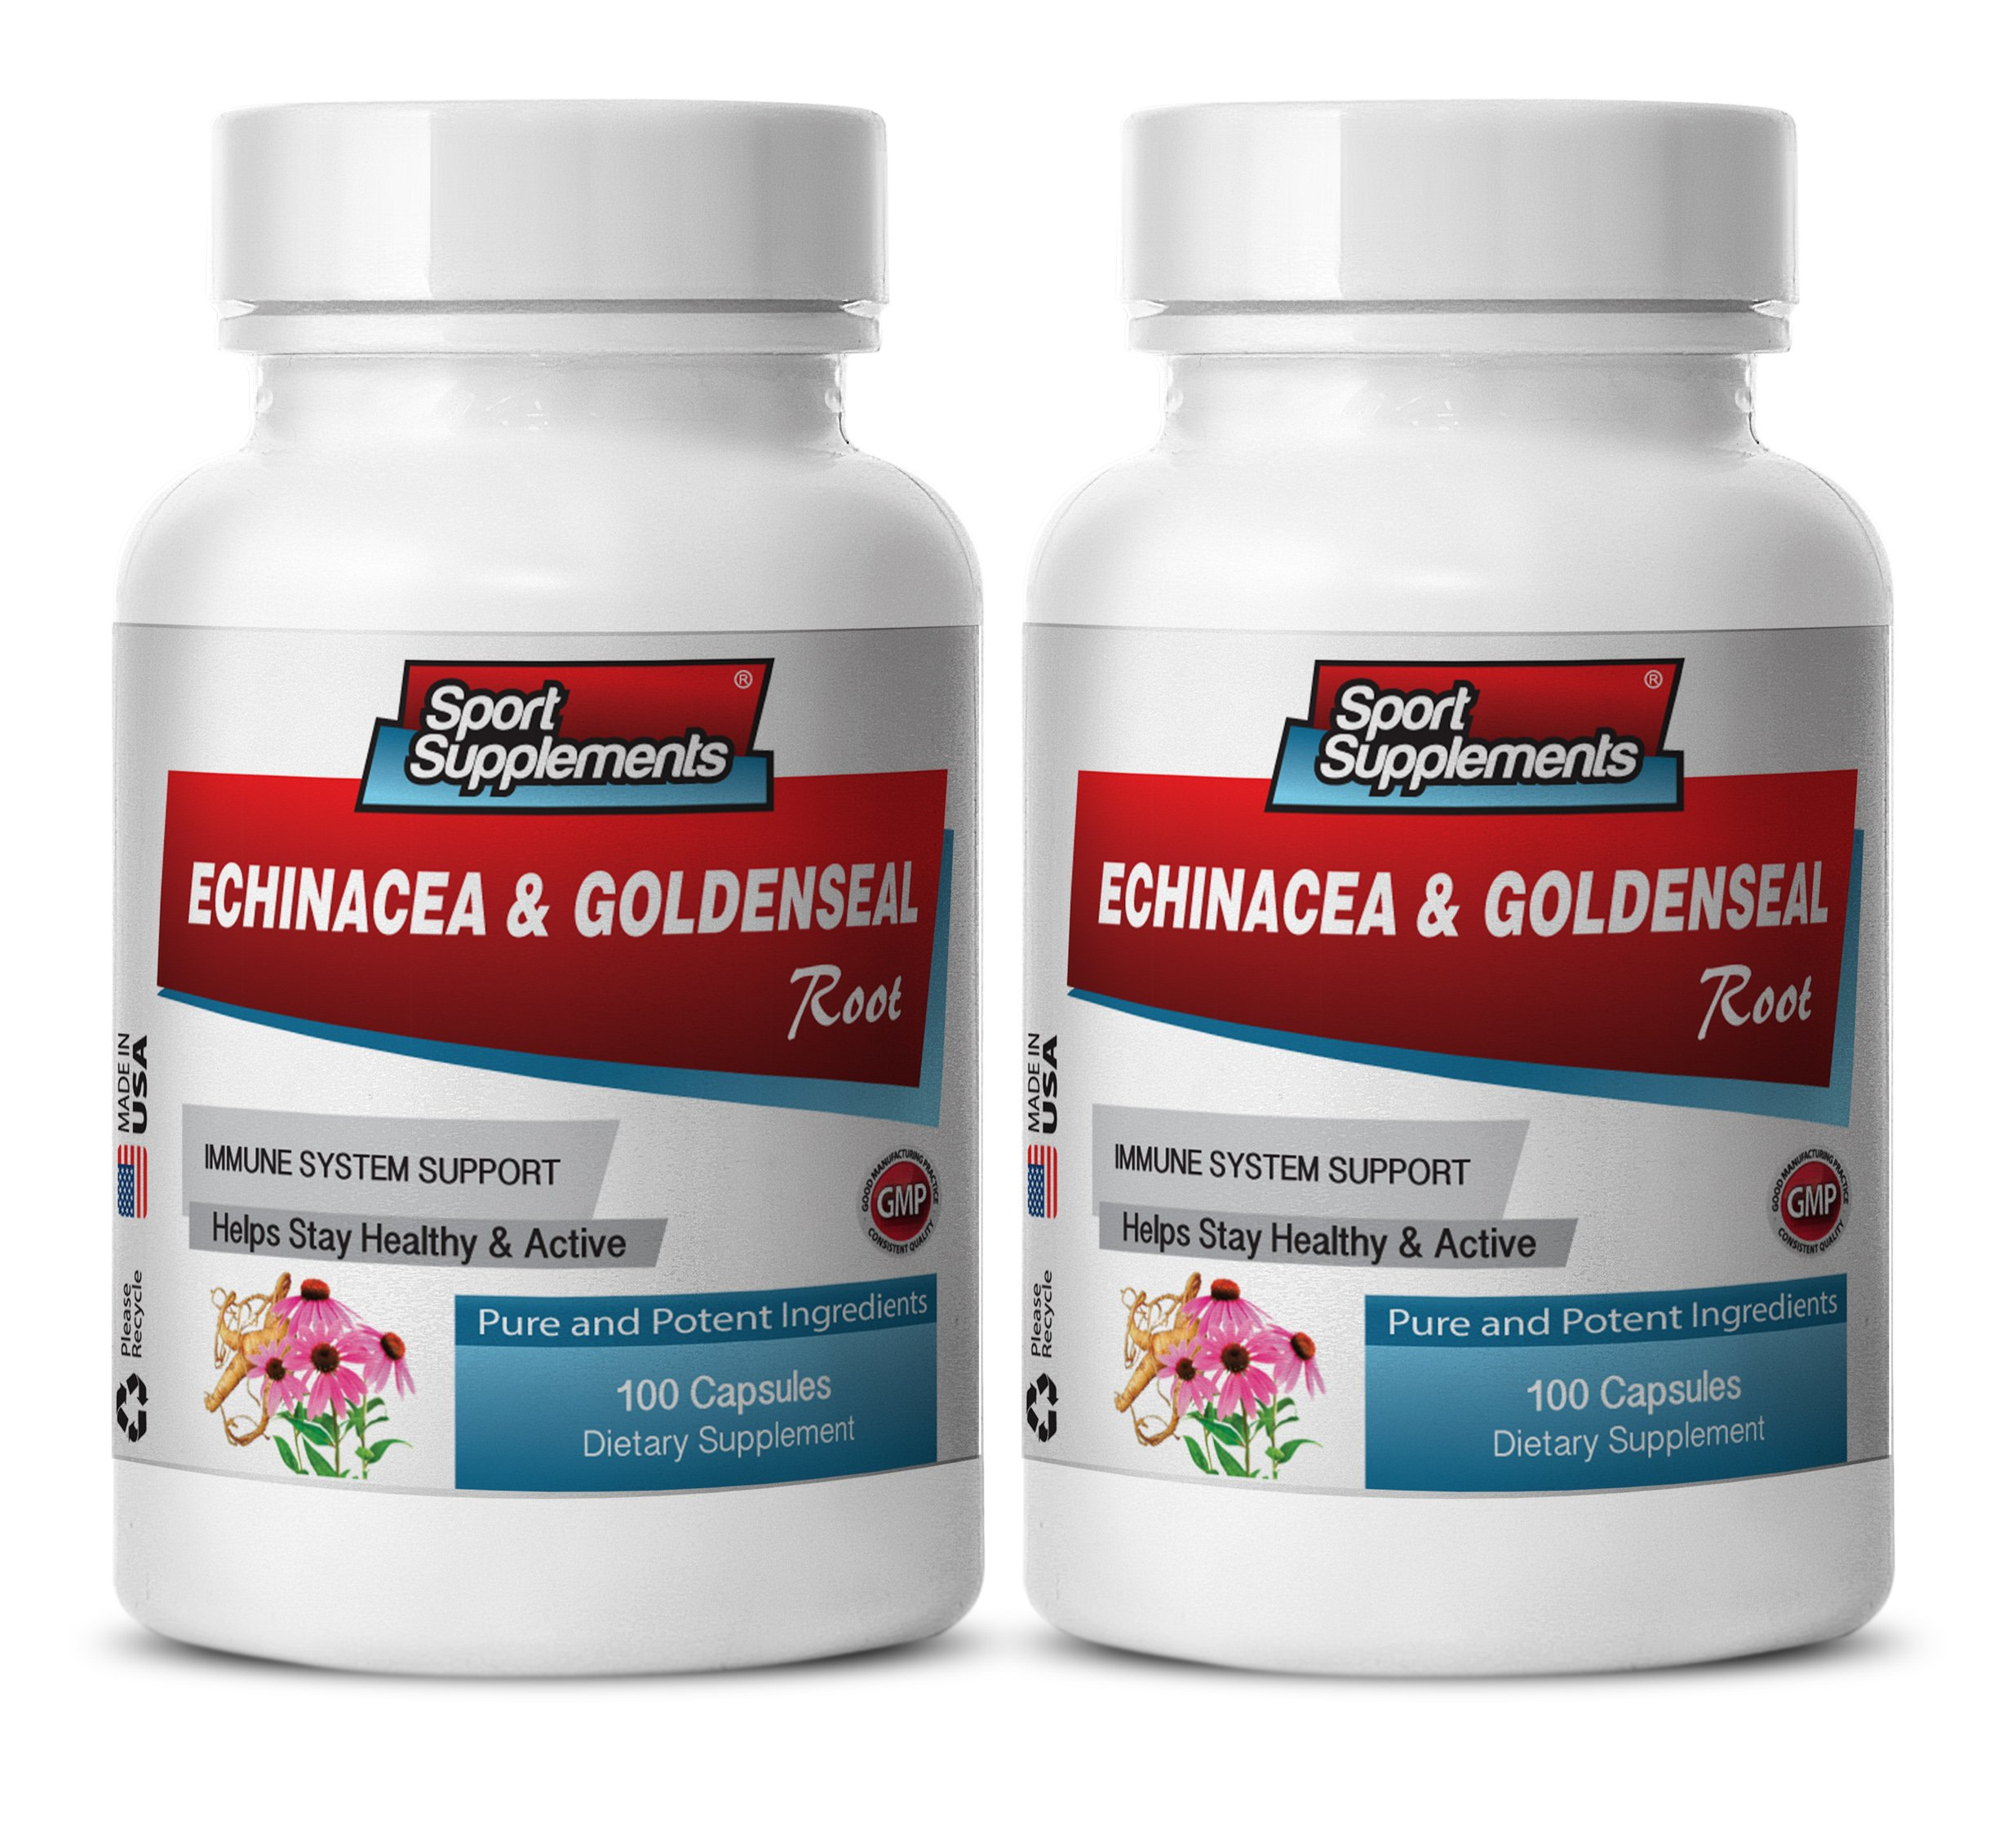 metabolism and energy - Echinacea & Goldenseal Root 300MG - goldenseal pills - 2 Bottles (200 Capsules)